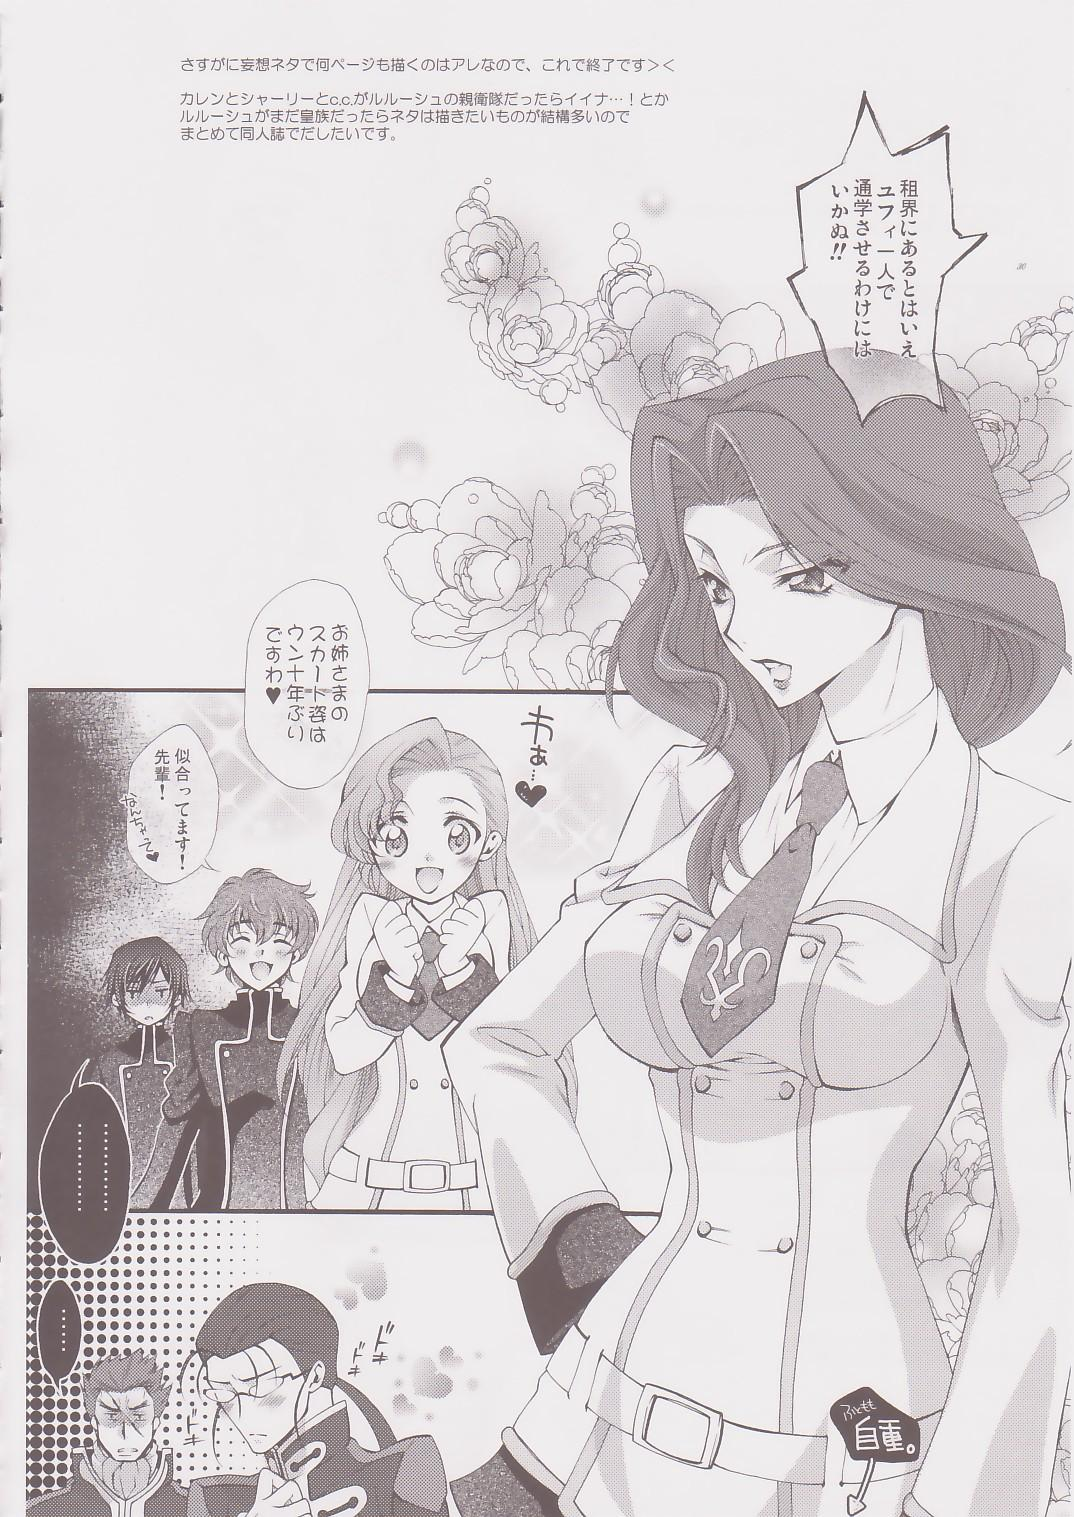 (COMIC1) [iYou (Mizuno Poppo, Yukkyun)] Britannia Tenseki Sui - Britannia The Scriptures - tipsy (CODE GEASS: Lelouch of the Rebellion) 28